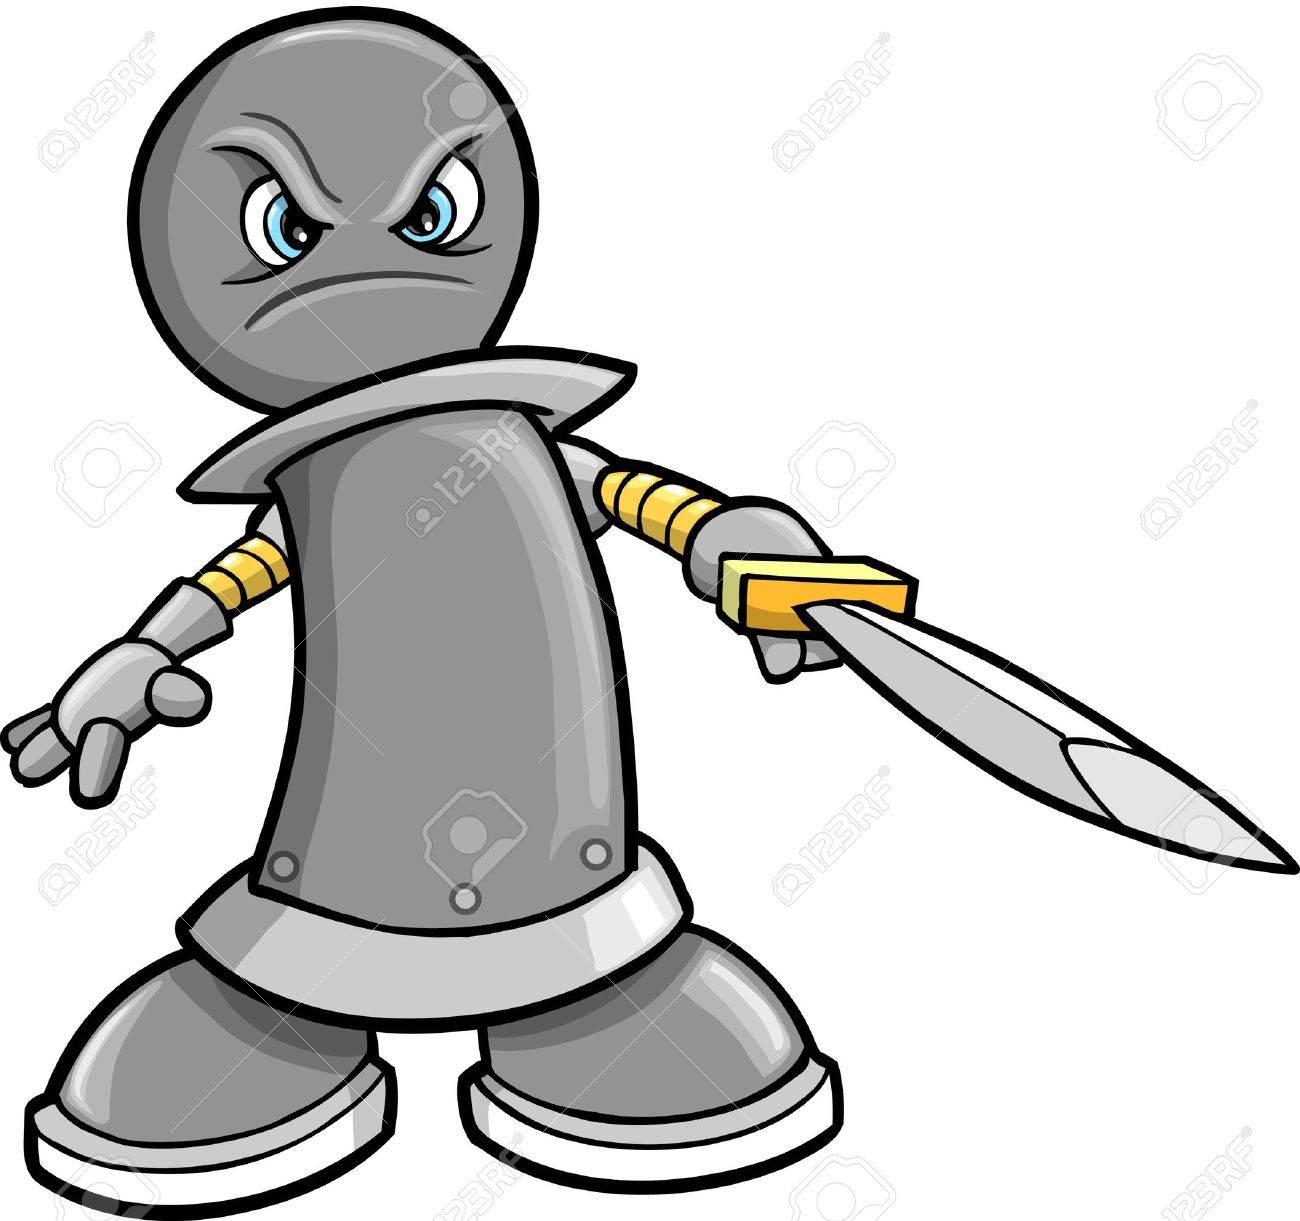 Cyborg Robotic Warrior Chess Rook Illustration Stock Vector - 10031047